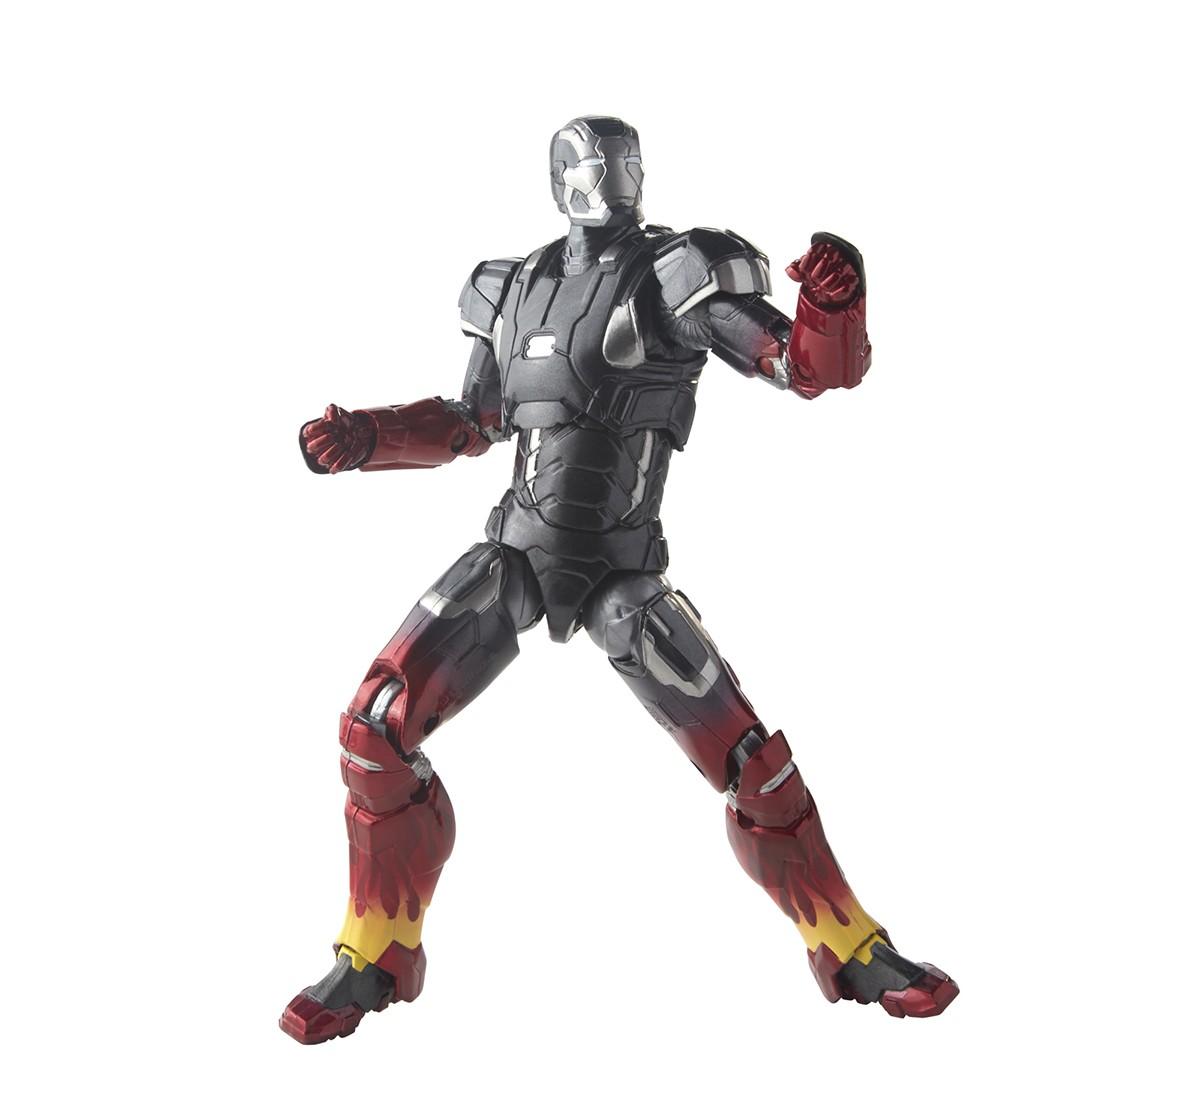 Marvel Iron Man 3 Pepper Potts, Iron Man Mark XXII & Mandarin  Action Figures for Boys age 4Y+